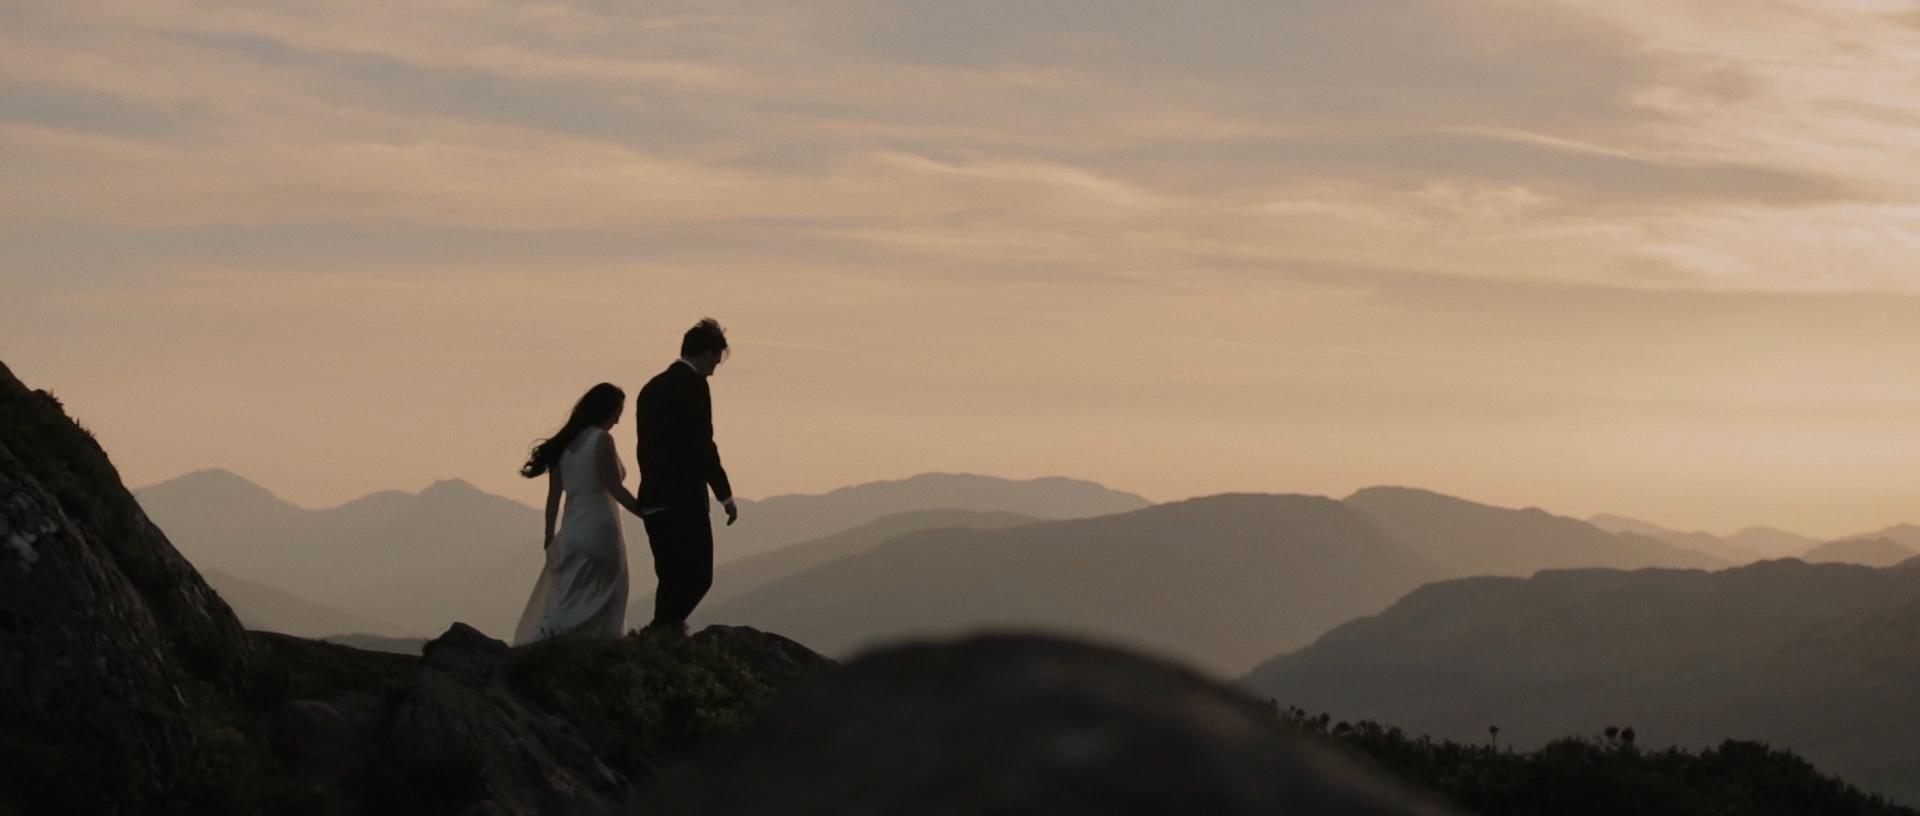 cambo-estate-wedding-videographer_LL_01.jpg